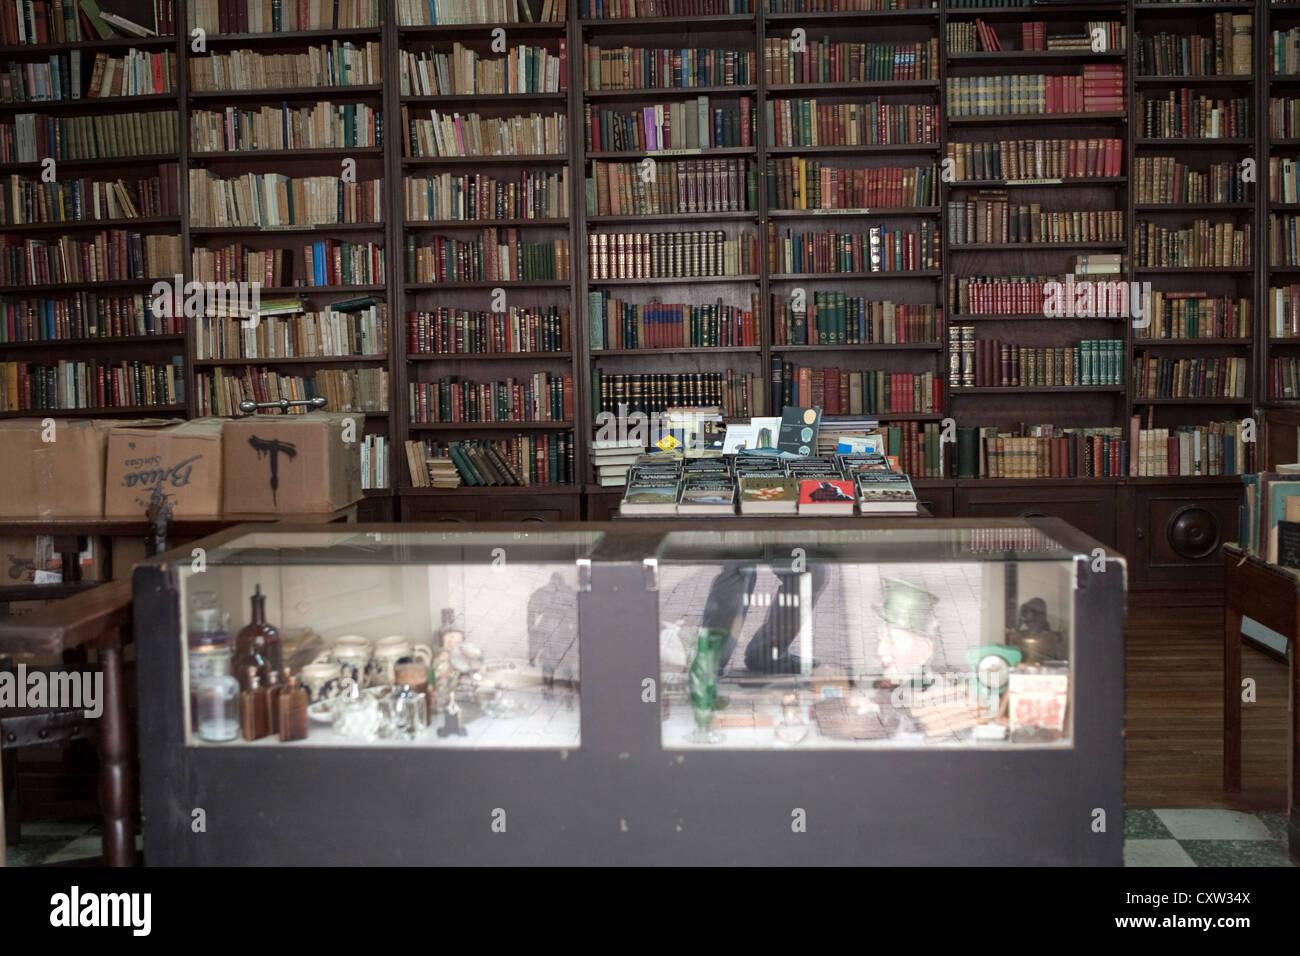 Academia Colombiana de Historia BookShop Bogota Colombia - Stock Image